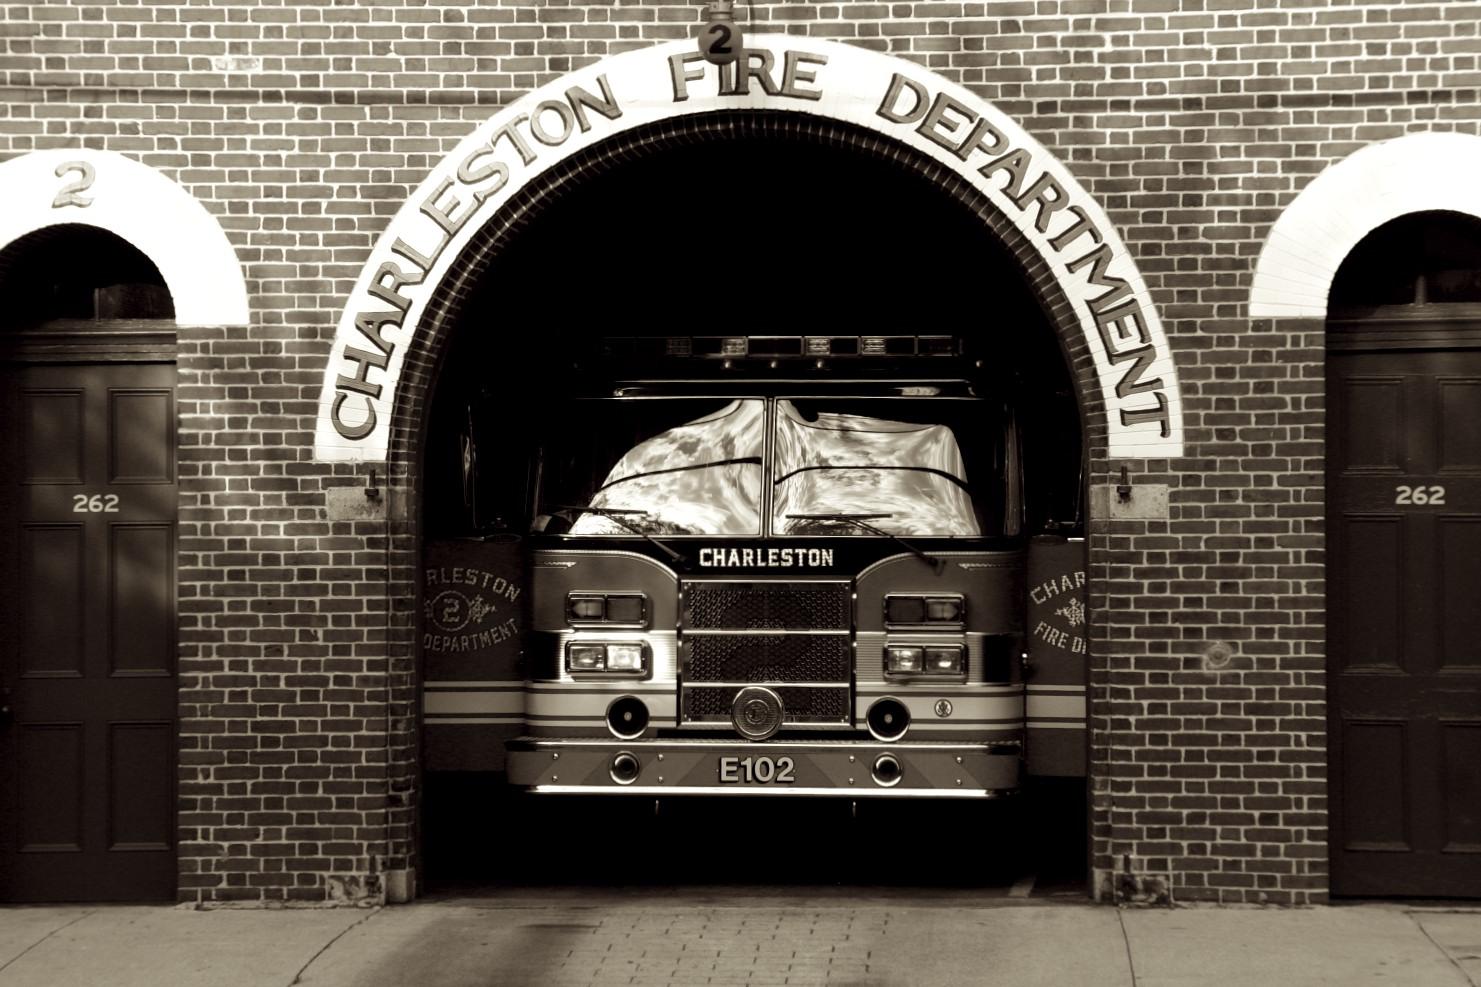 Fire Truck in Charleston, South Carolina